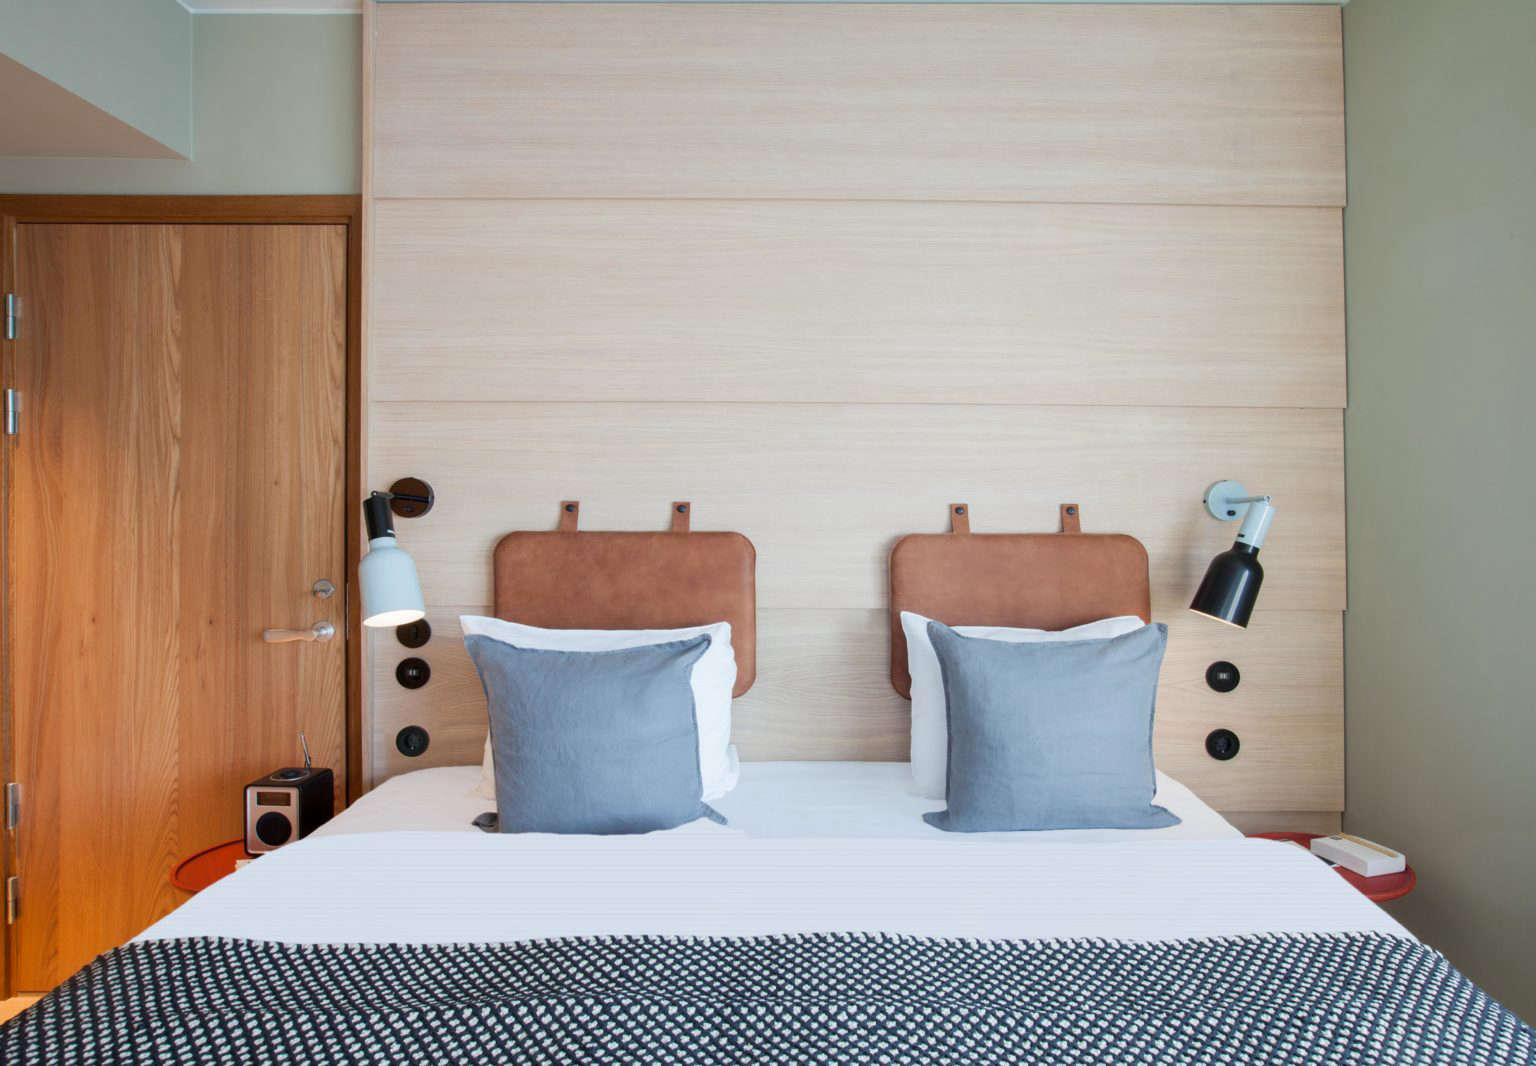 hobo hotel stockholm studio aisslinger design patricia parinejad photo 5 1536x1066